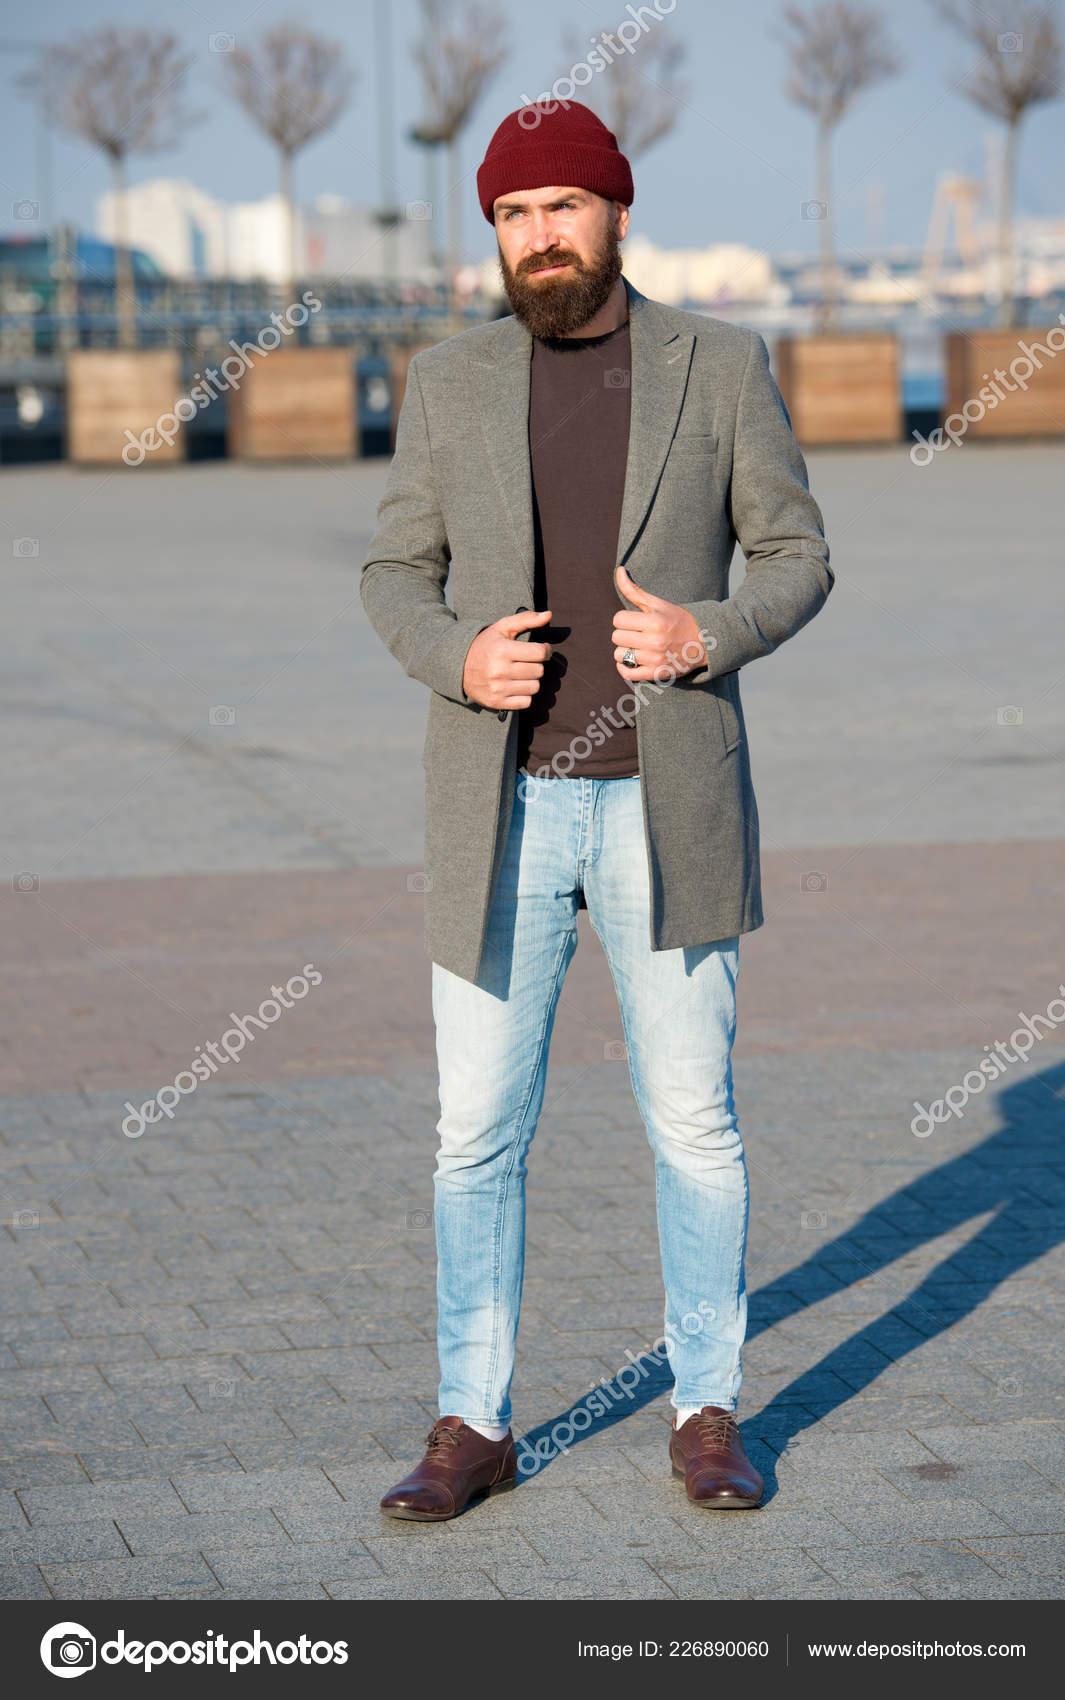 79ce9da652b Κομψά casual ντύσιμο για τη σεζόν φθινόπωρο και το χειμώνα. Ανδρικά  ενδύματα και έννοιας ανδρικής μόδας. Ο άνθρωπος γένια hipster κομψό  μοντέρνο παλτό και ...